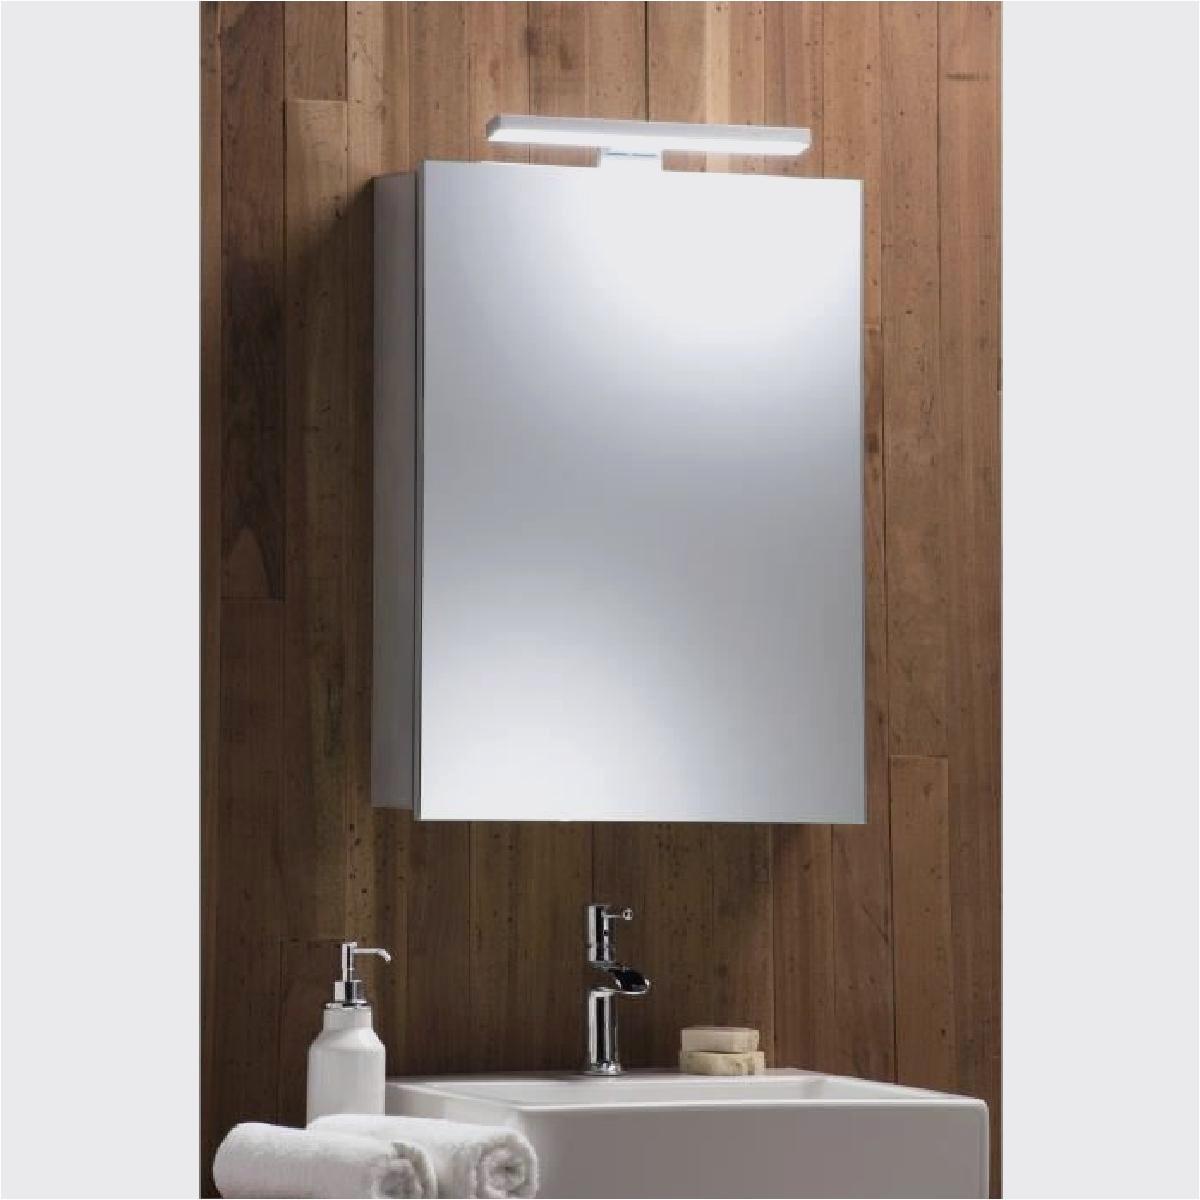 Armoire De toilette Miroir Leroy Merlin Élégant Photographie 42 élégant S De Armoire De toilette Avec Miroir